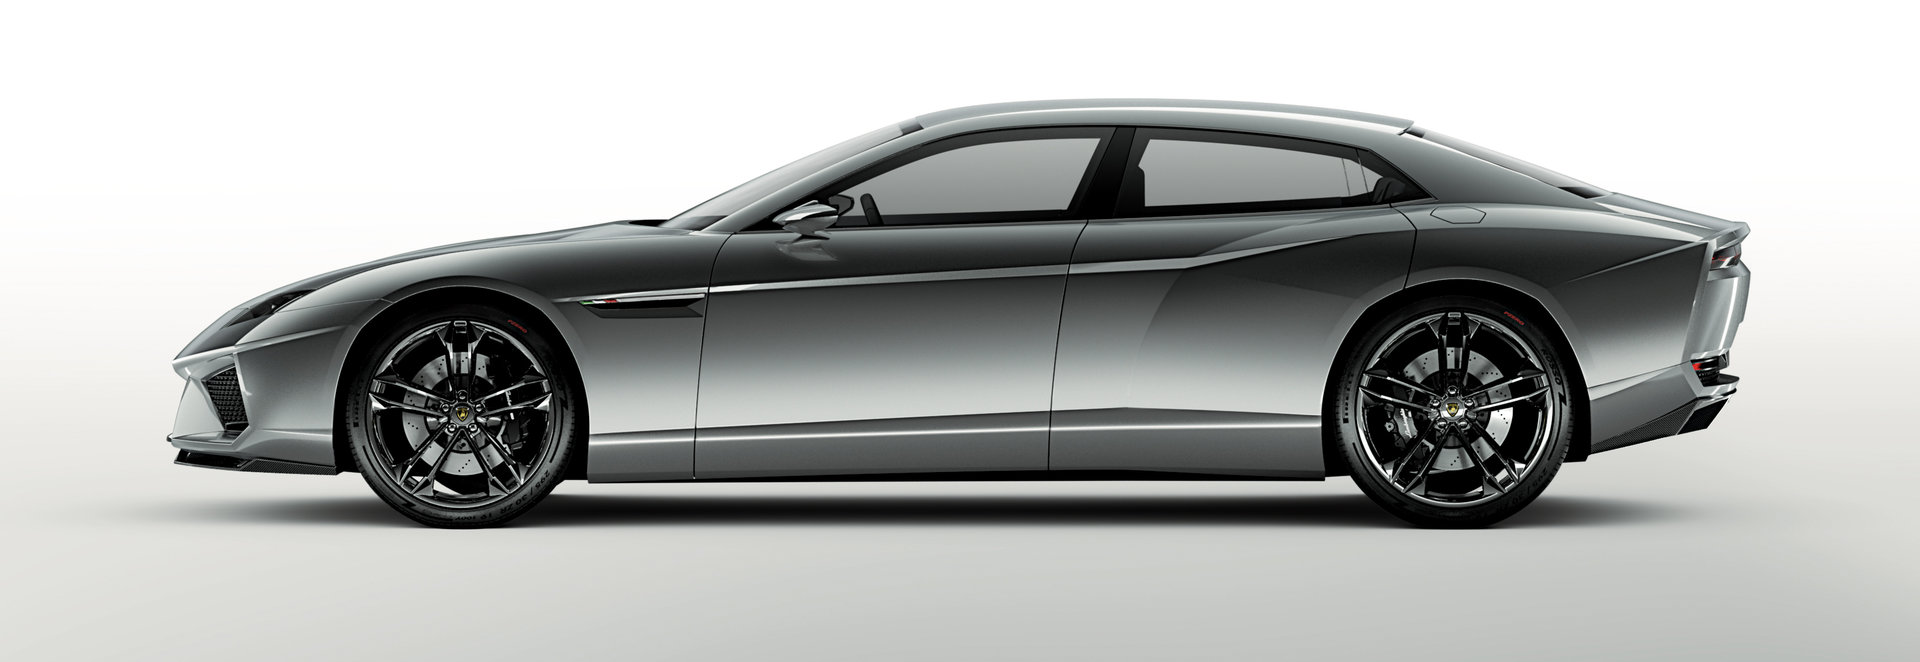 Coche del día: Lamborghini Estoque